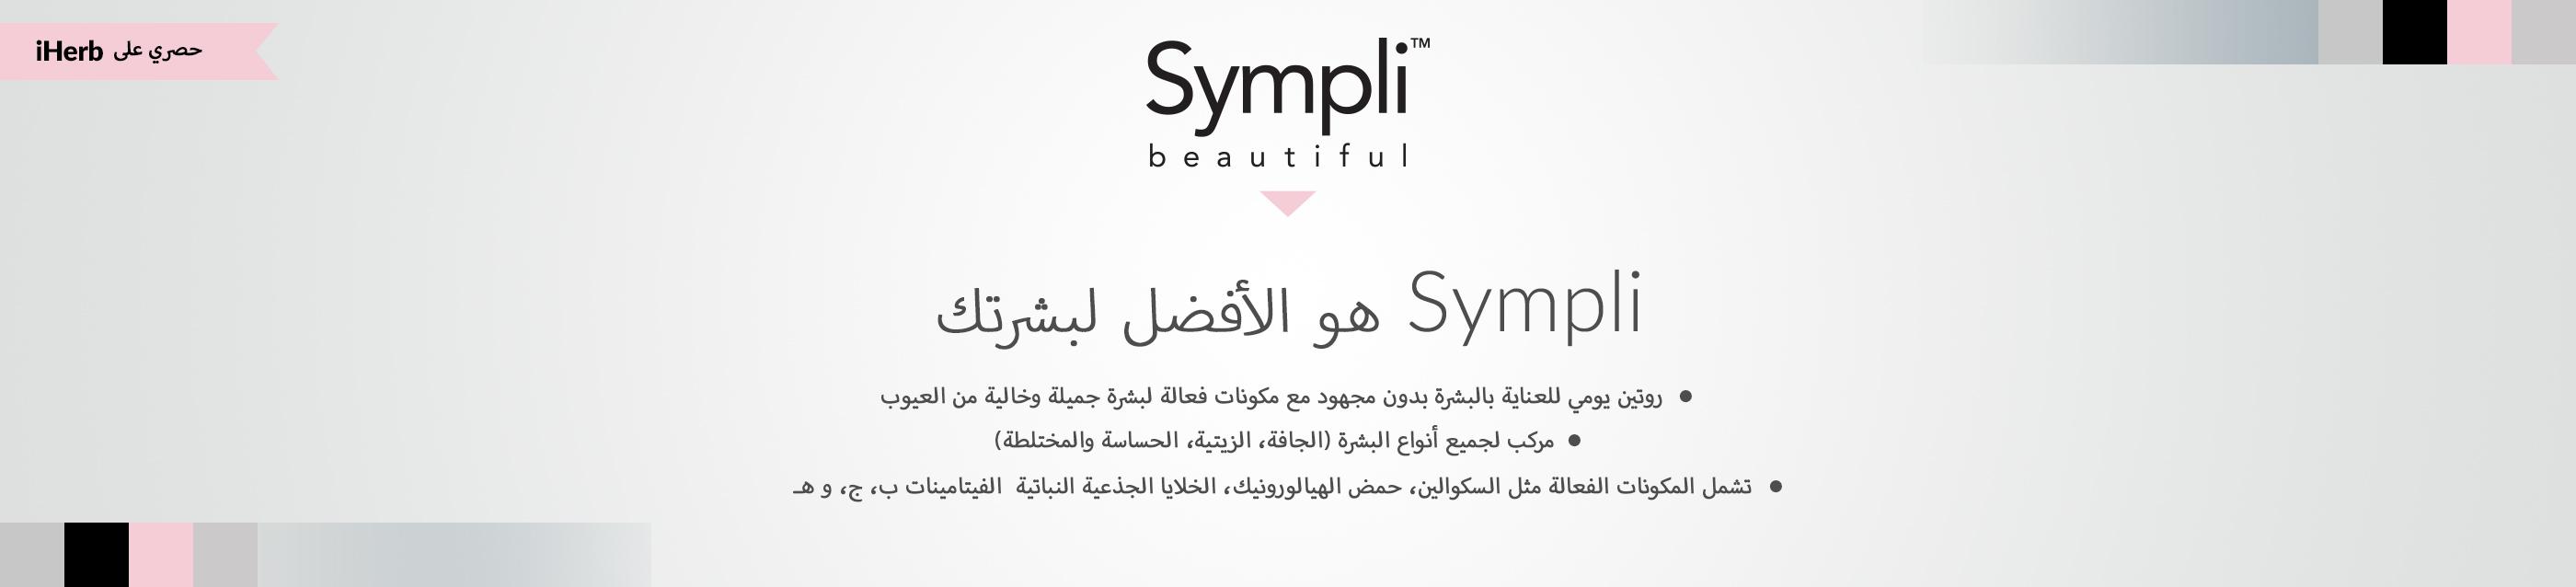 Sympli Beautiful